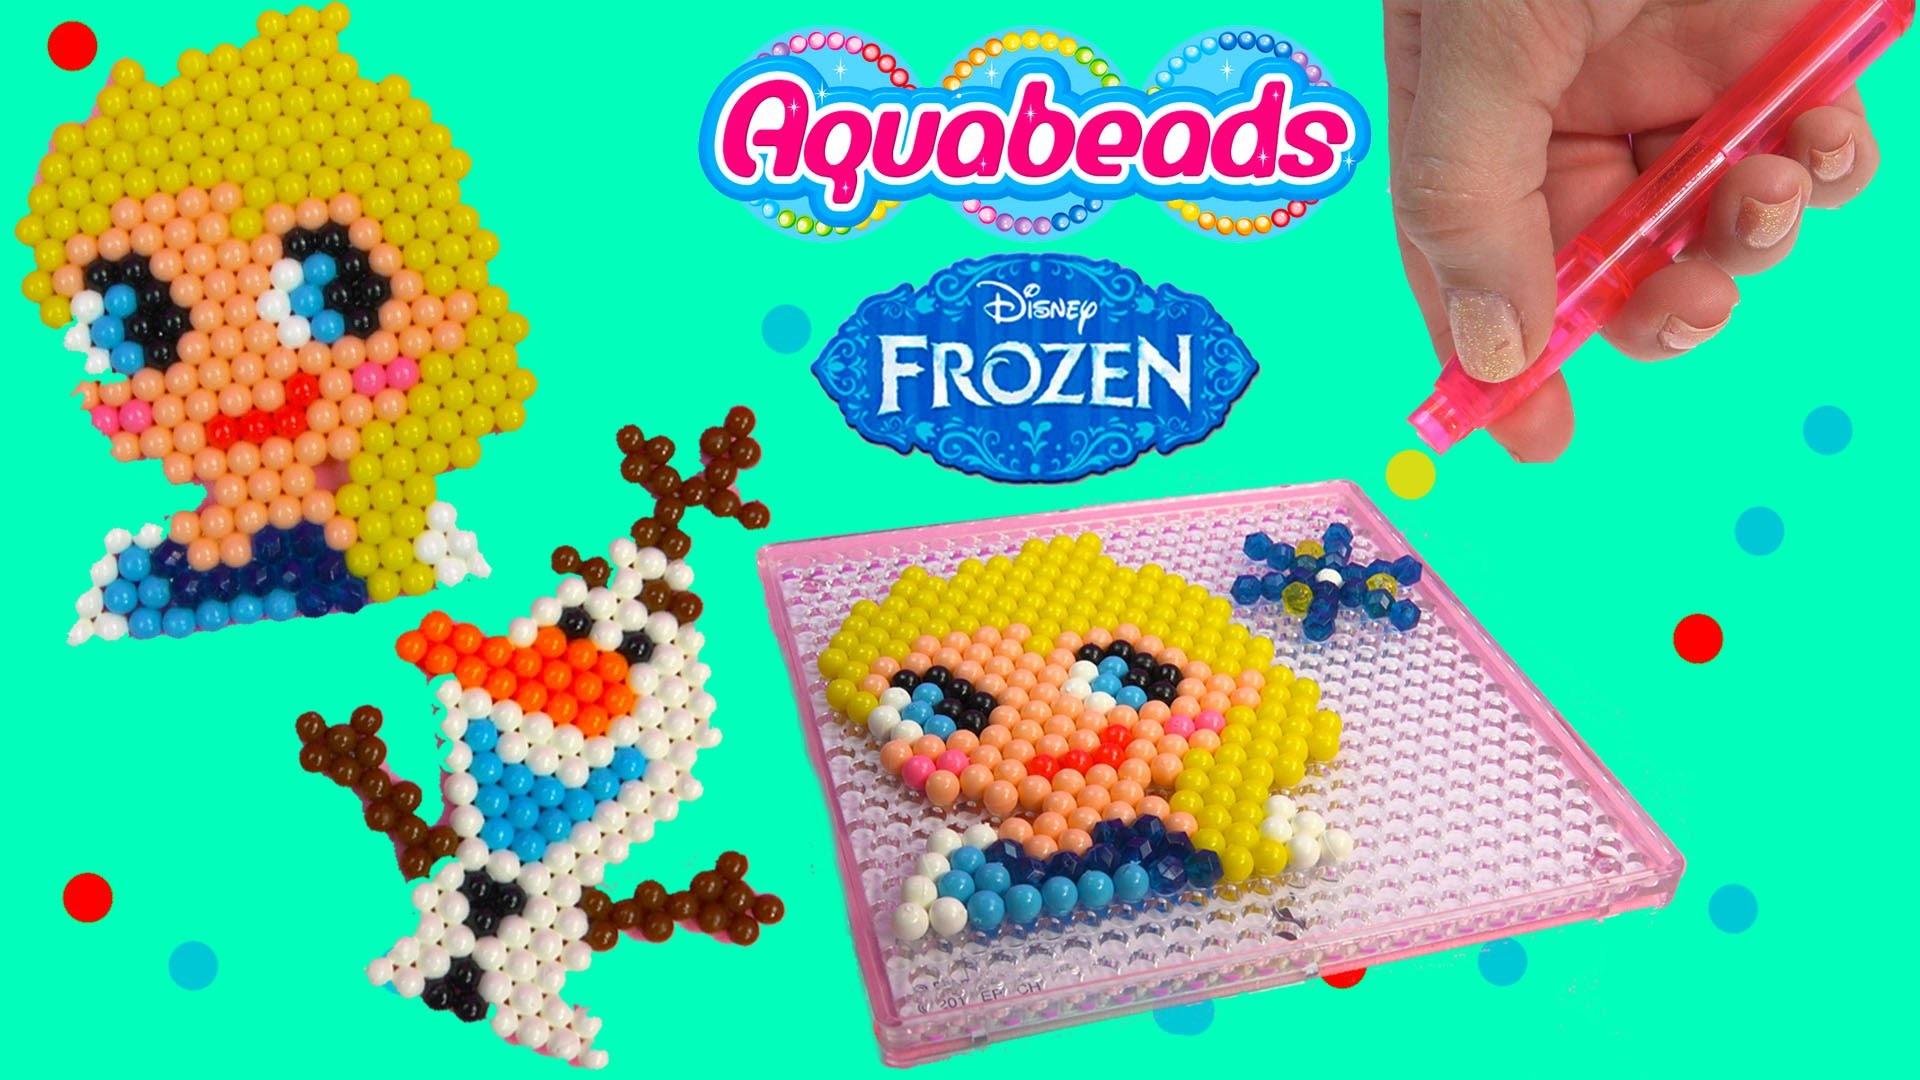 Queen Elsa Olaf Snowman Disney Frozen Water Beados like Aqua Beads Fun Simple Craft Playset